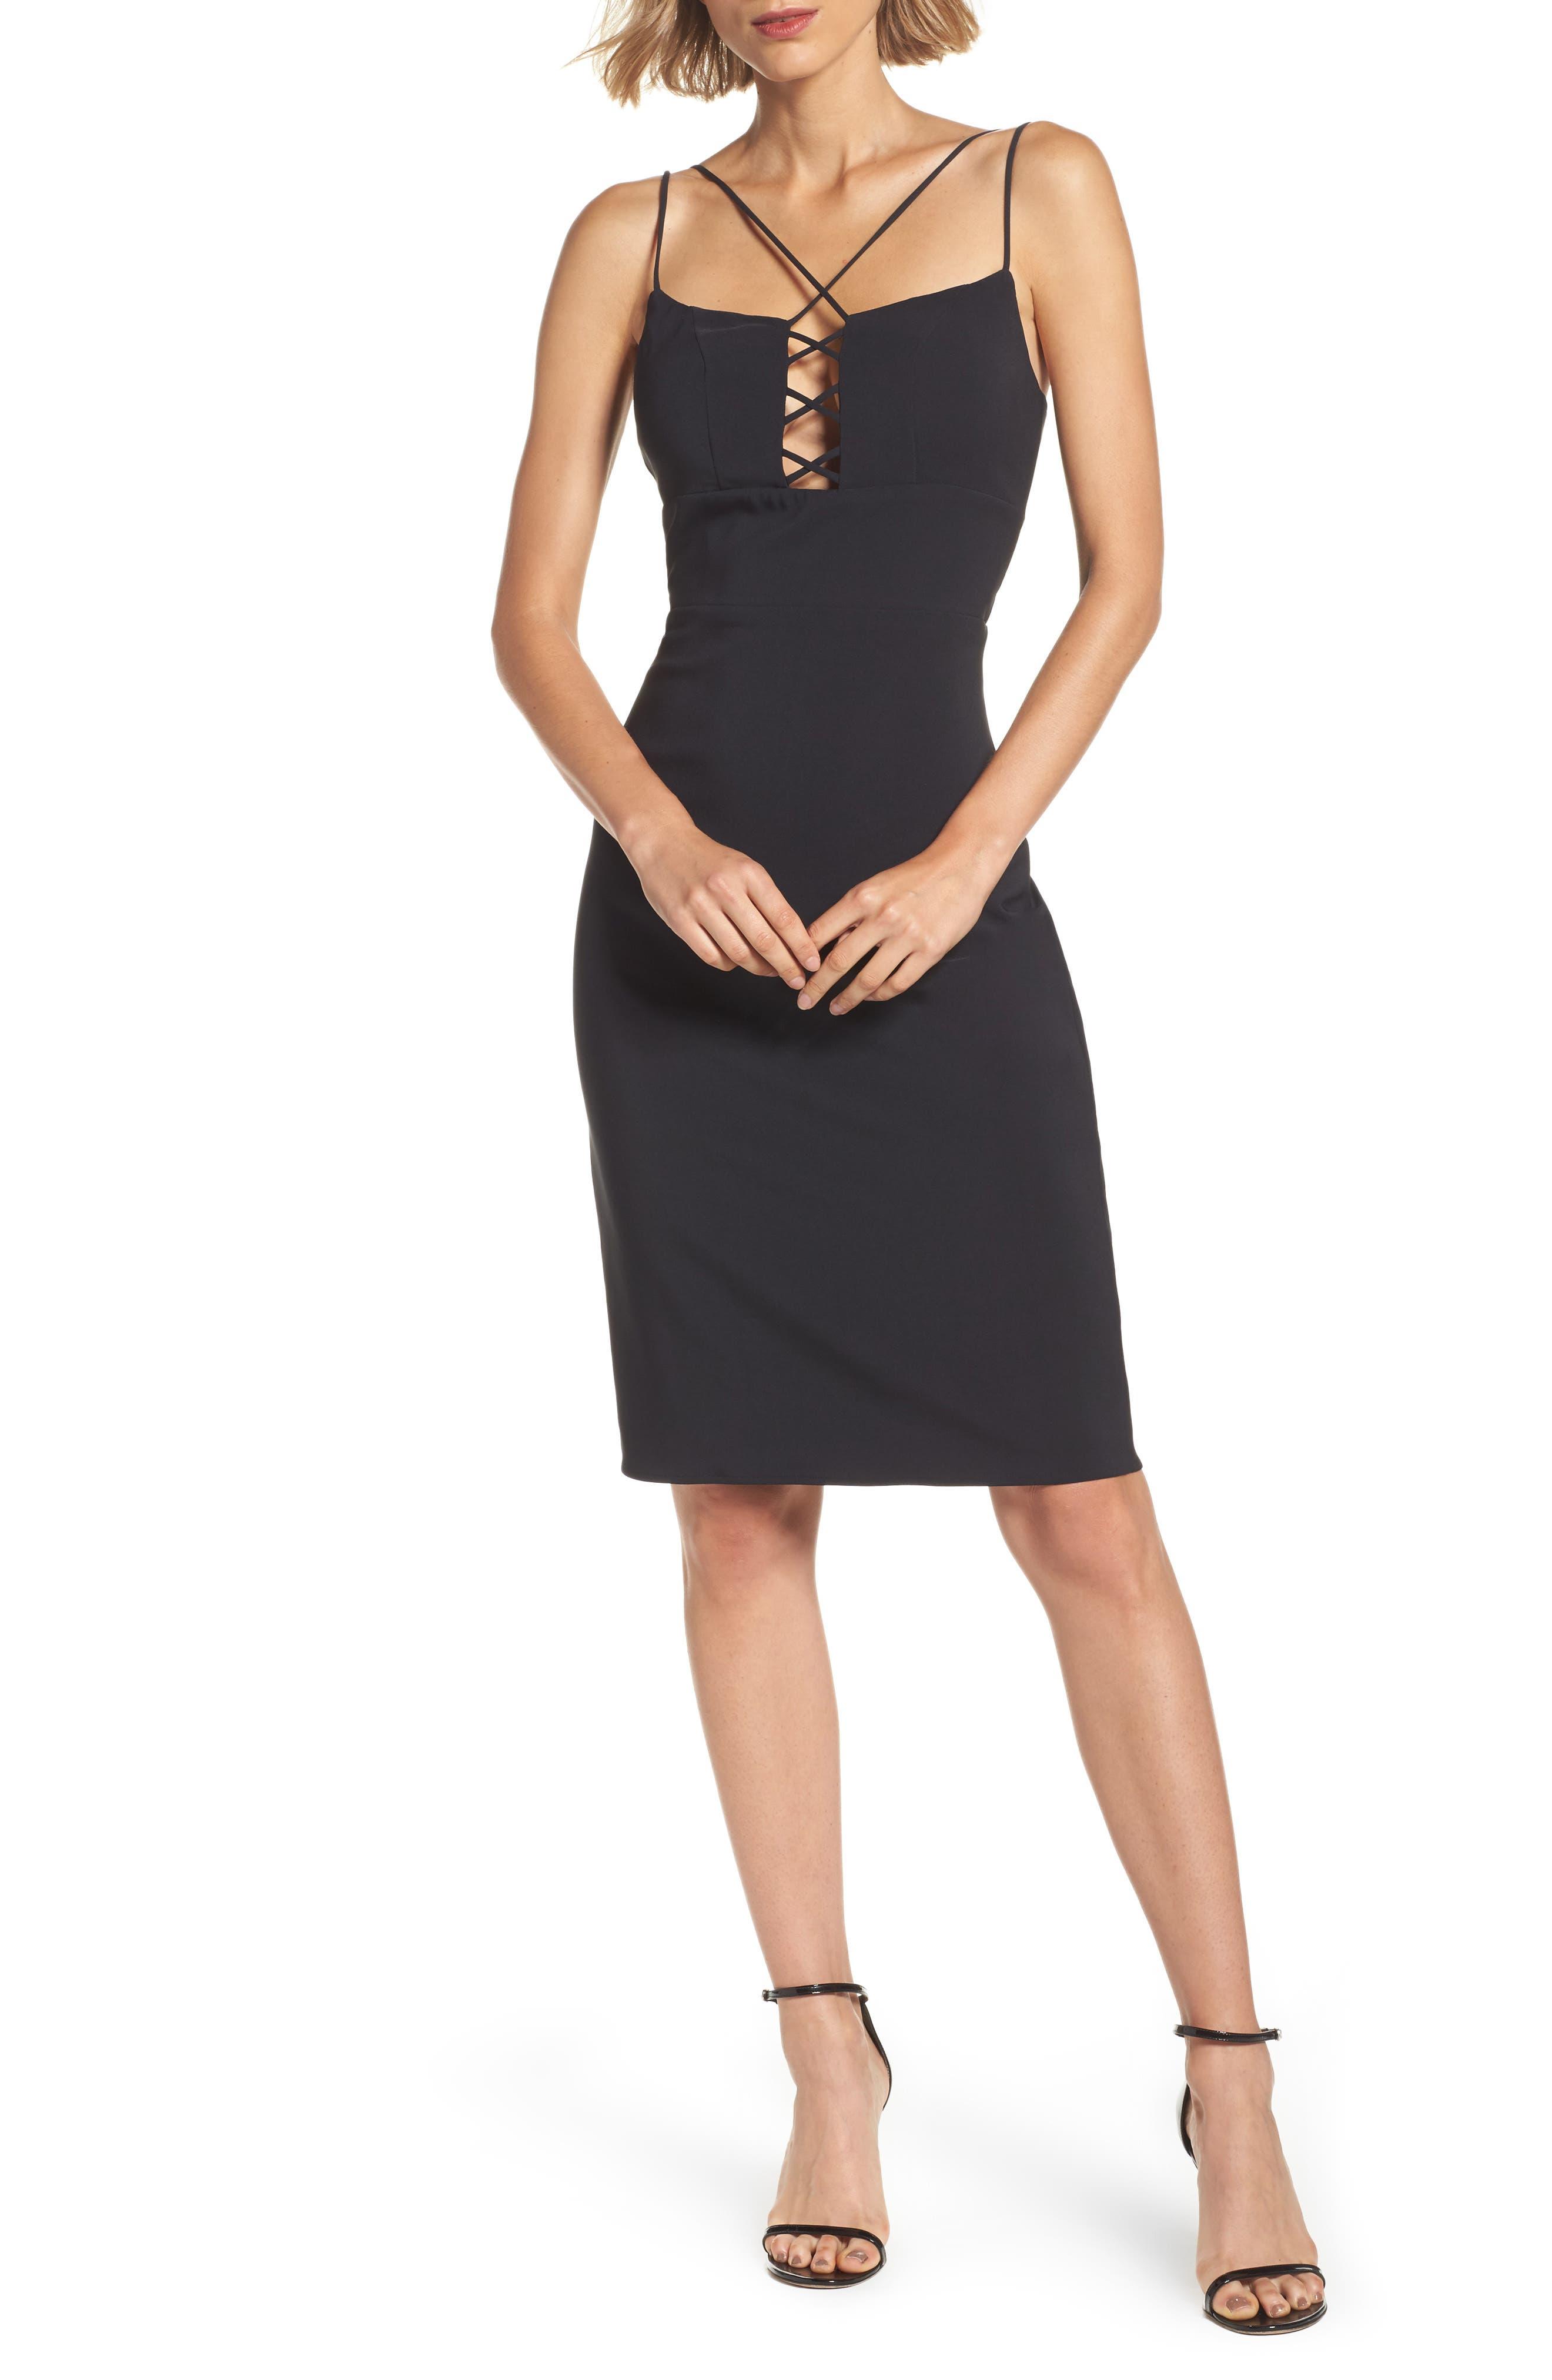 Alternate Image 1 Selected - Maria Bianca Nero Lace Front Sheath Dress